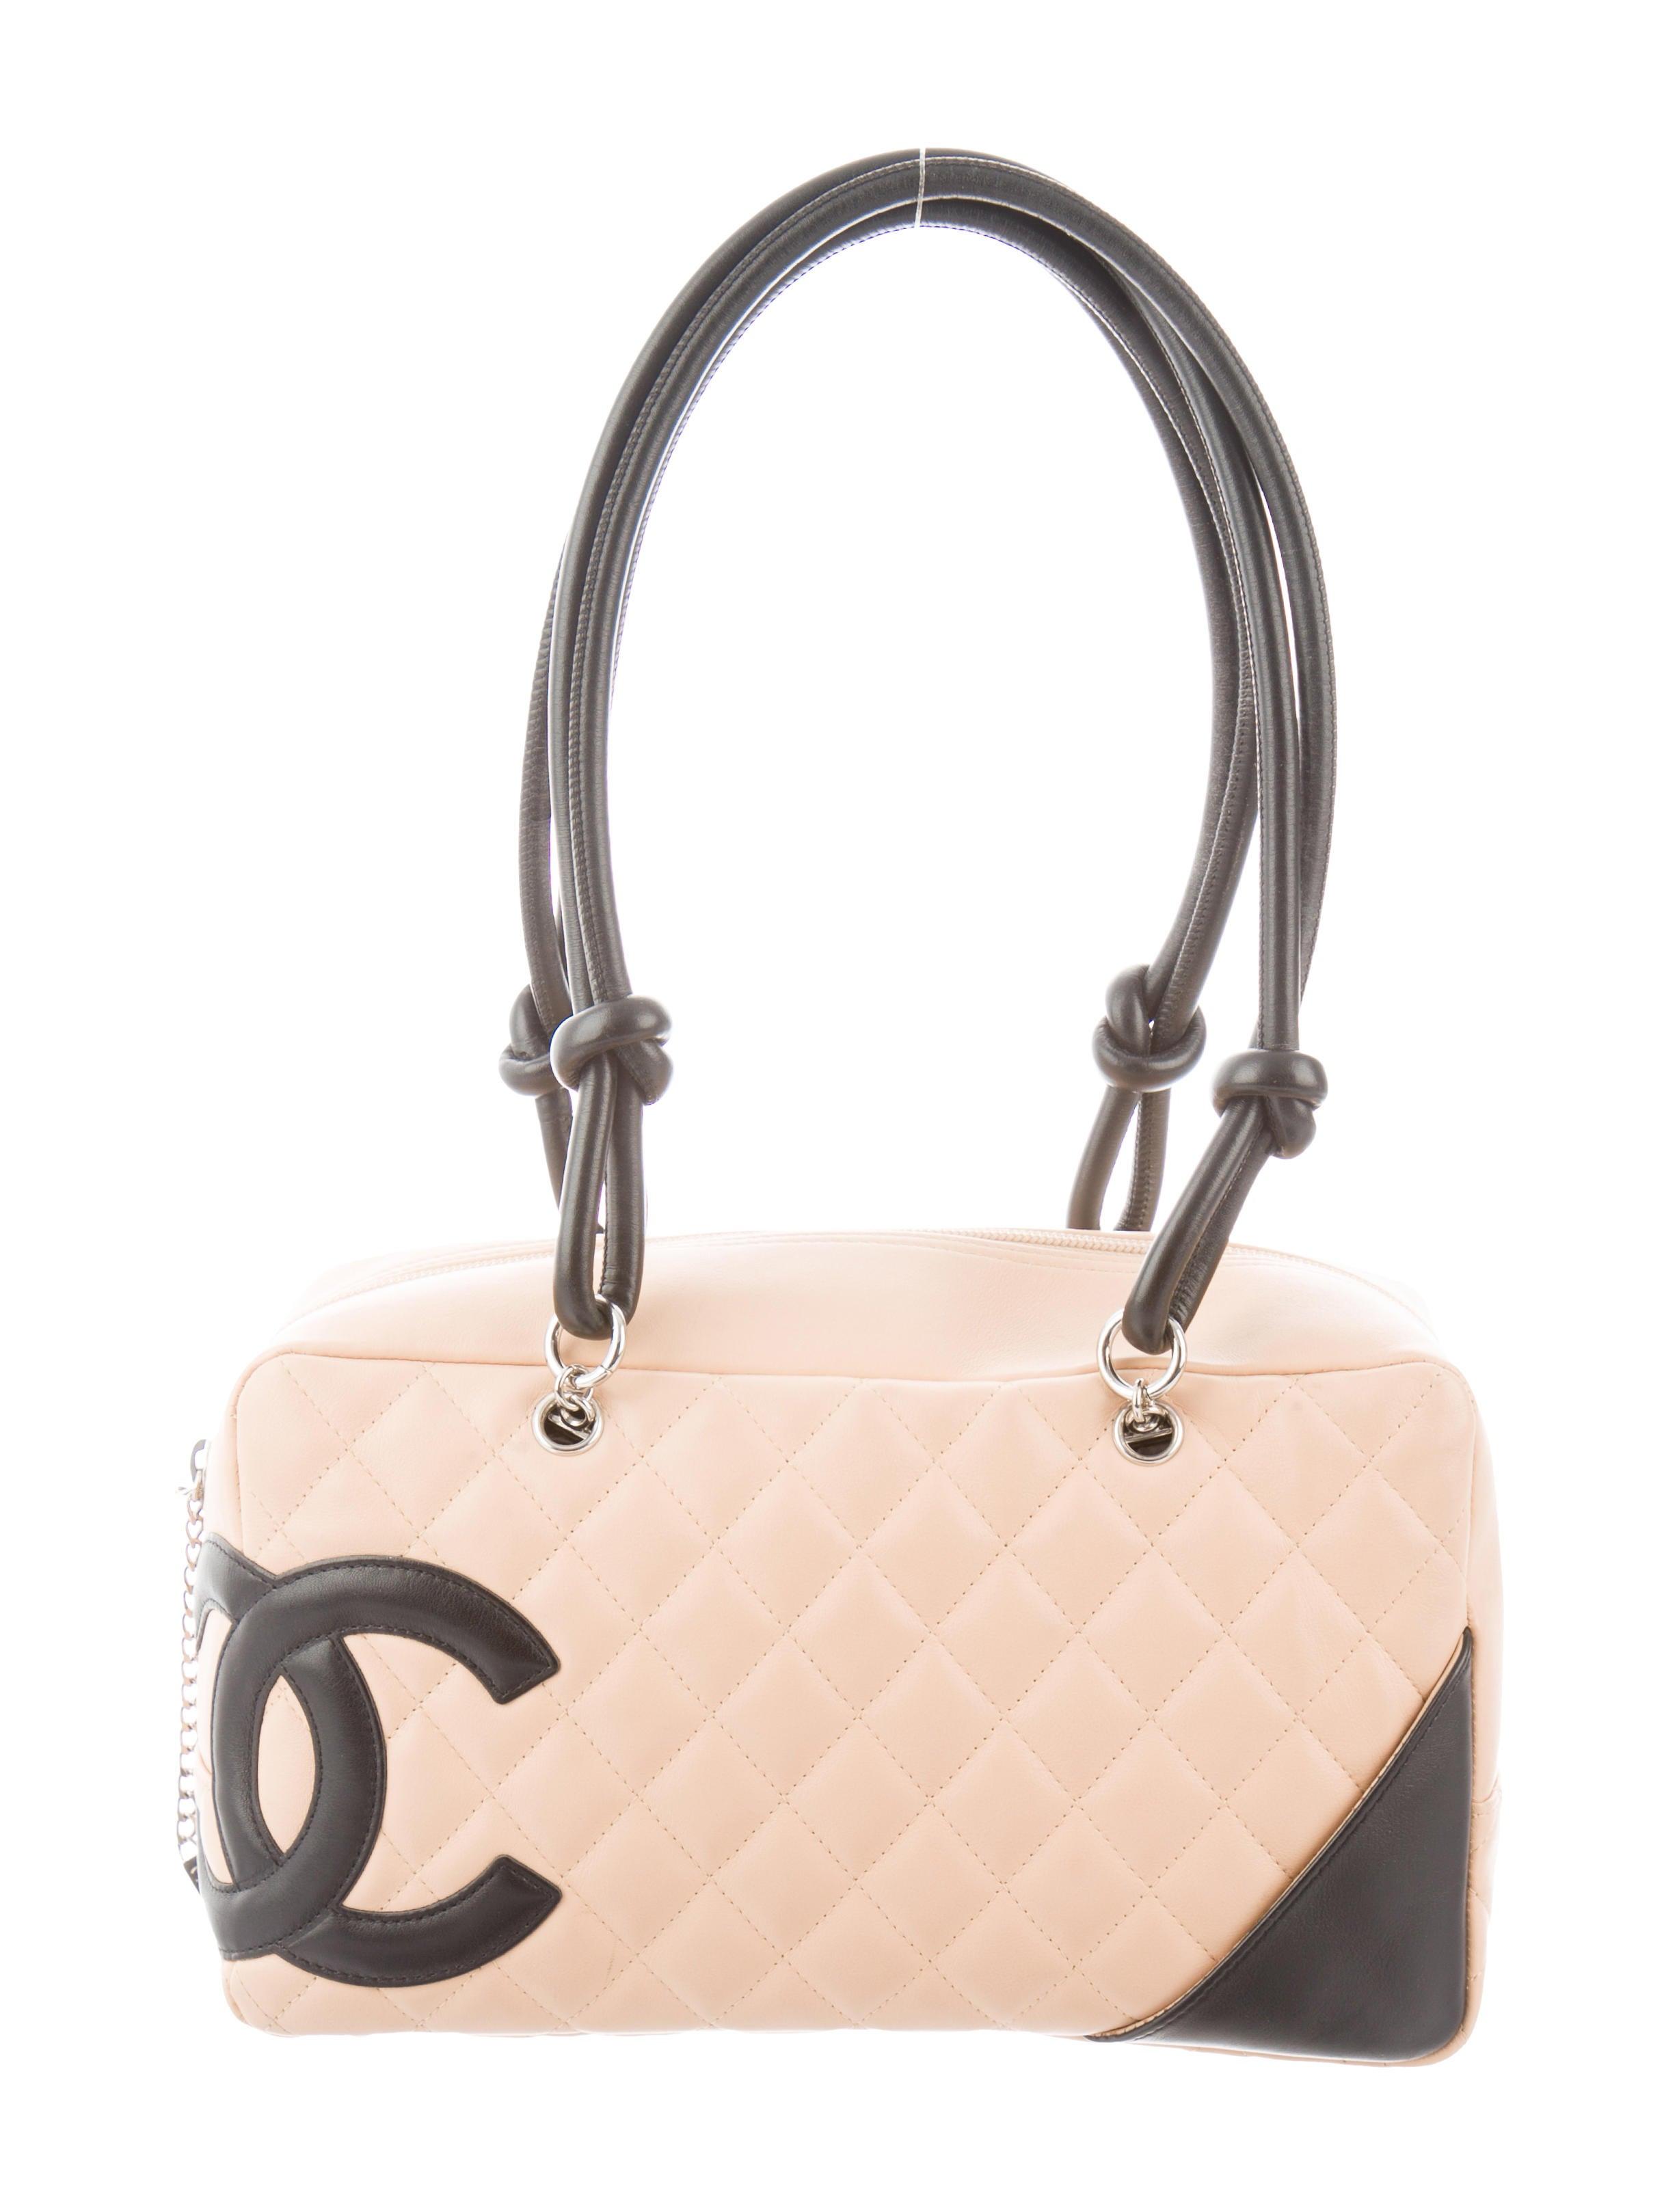 b72e6e7d8ecb Chanel Ligne Cambon Bowler Bag - Handbags - CHA344968